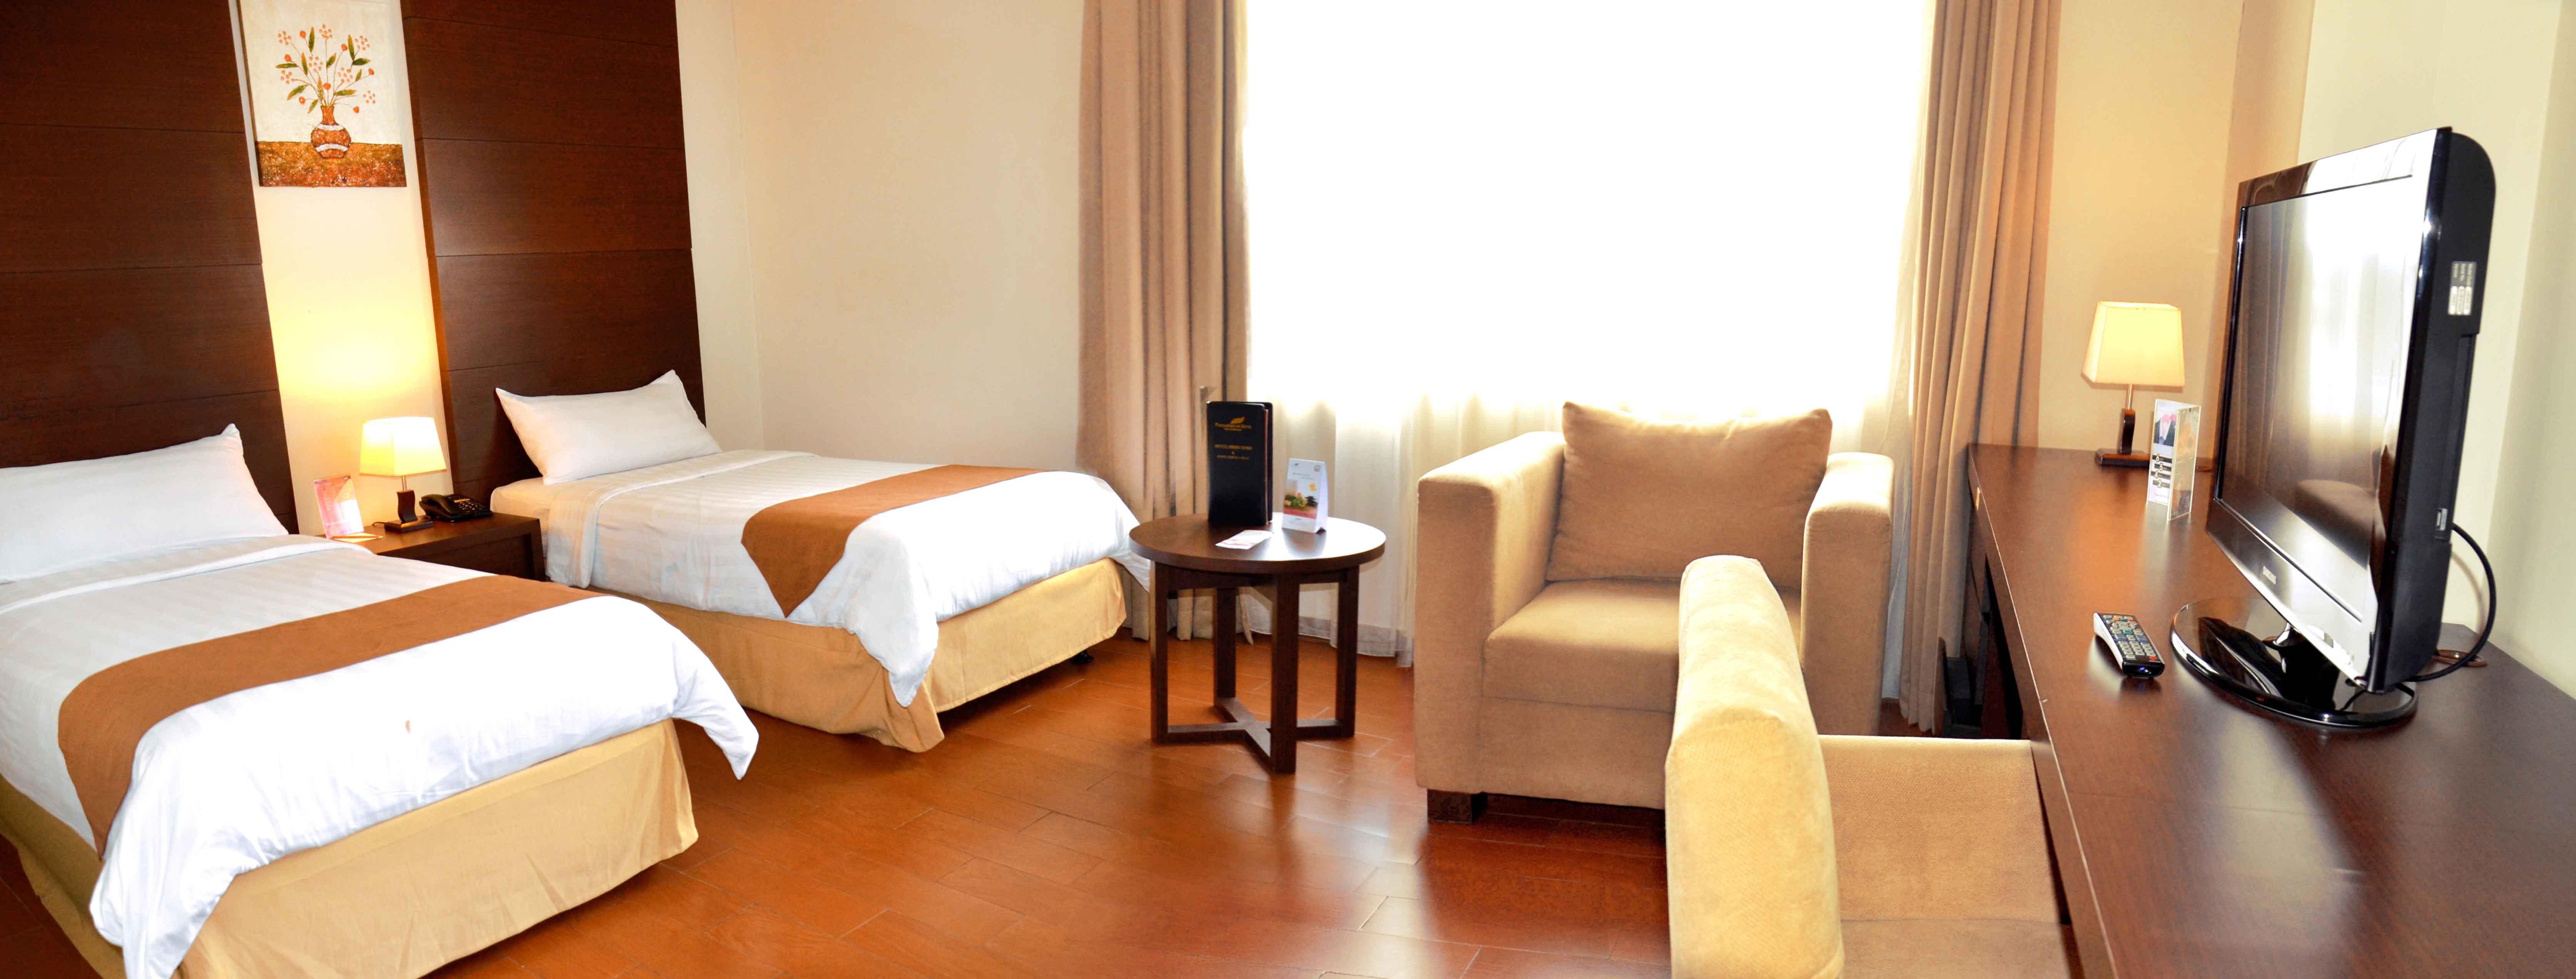 Padjadjaran Suites Hotel Conference Detail Taman Air Nirwana Bandung Kab